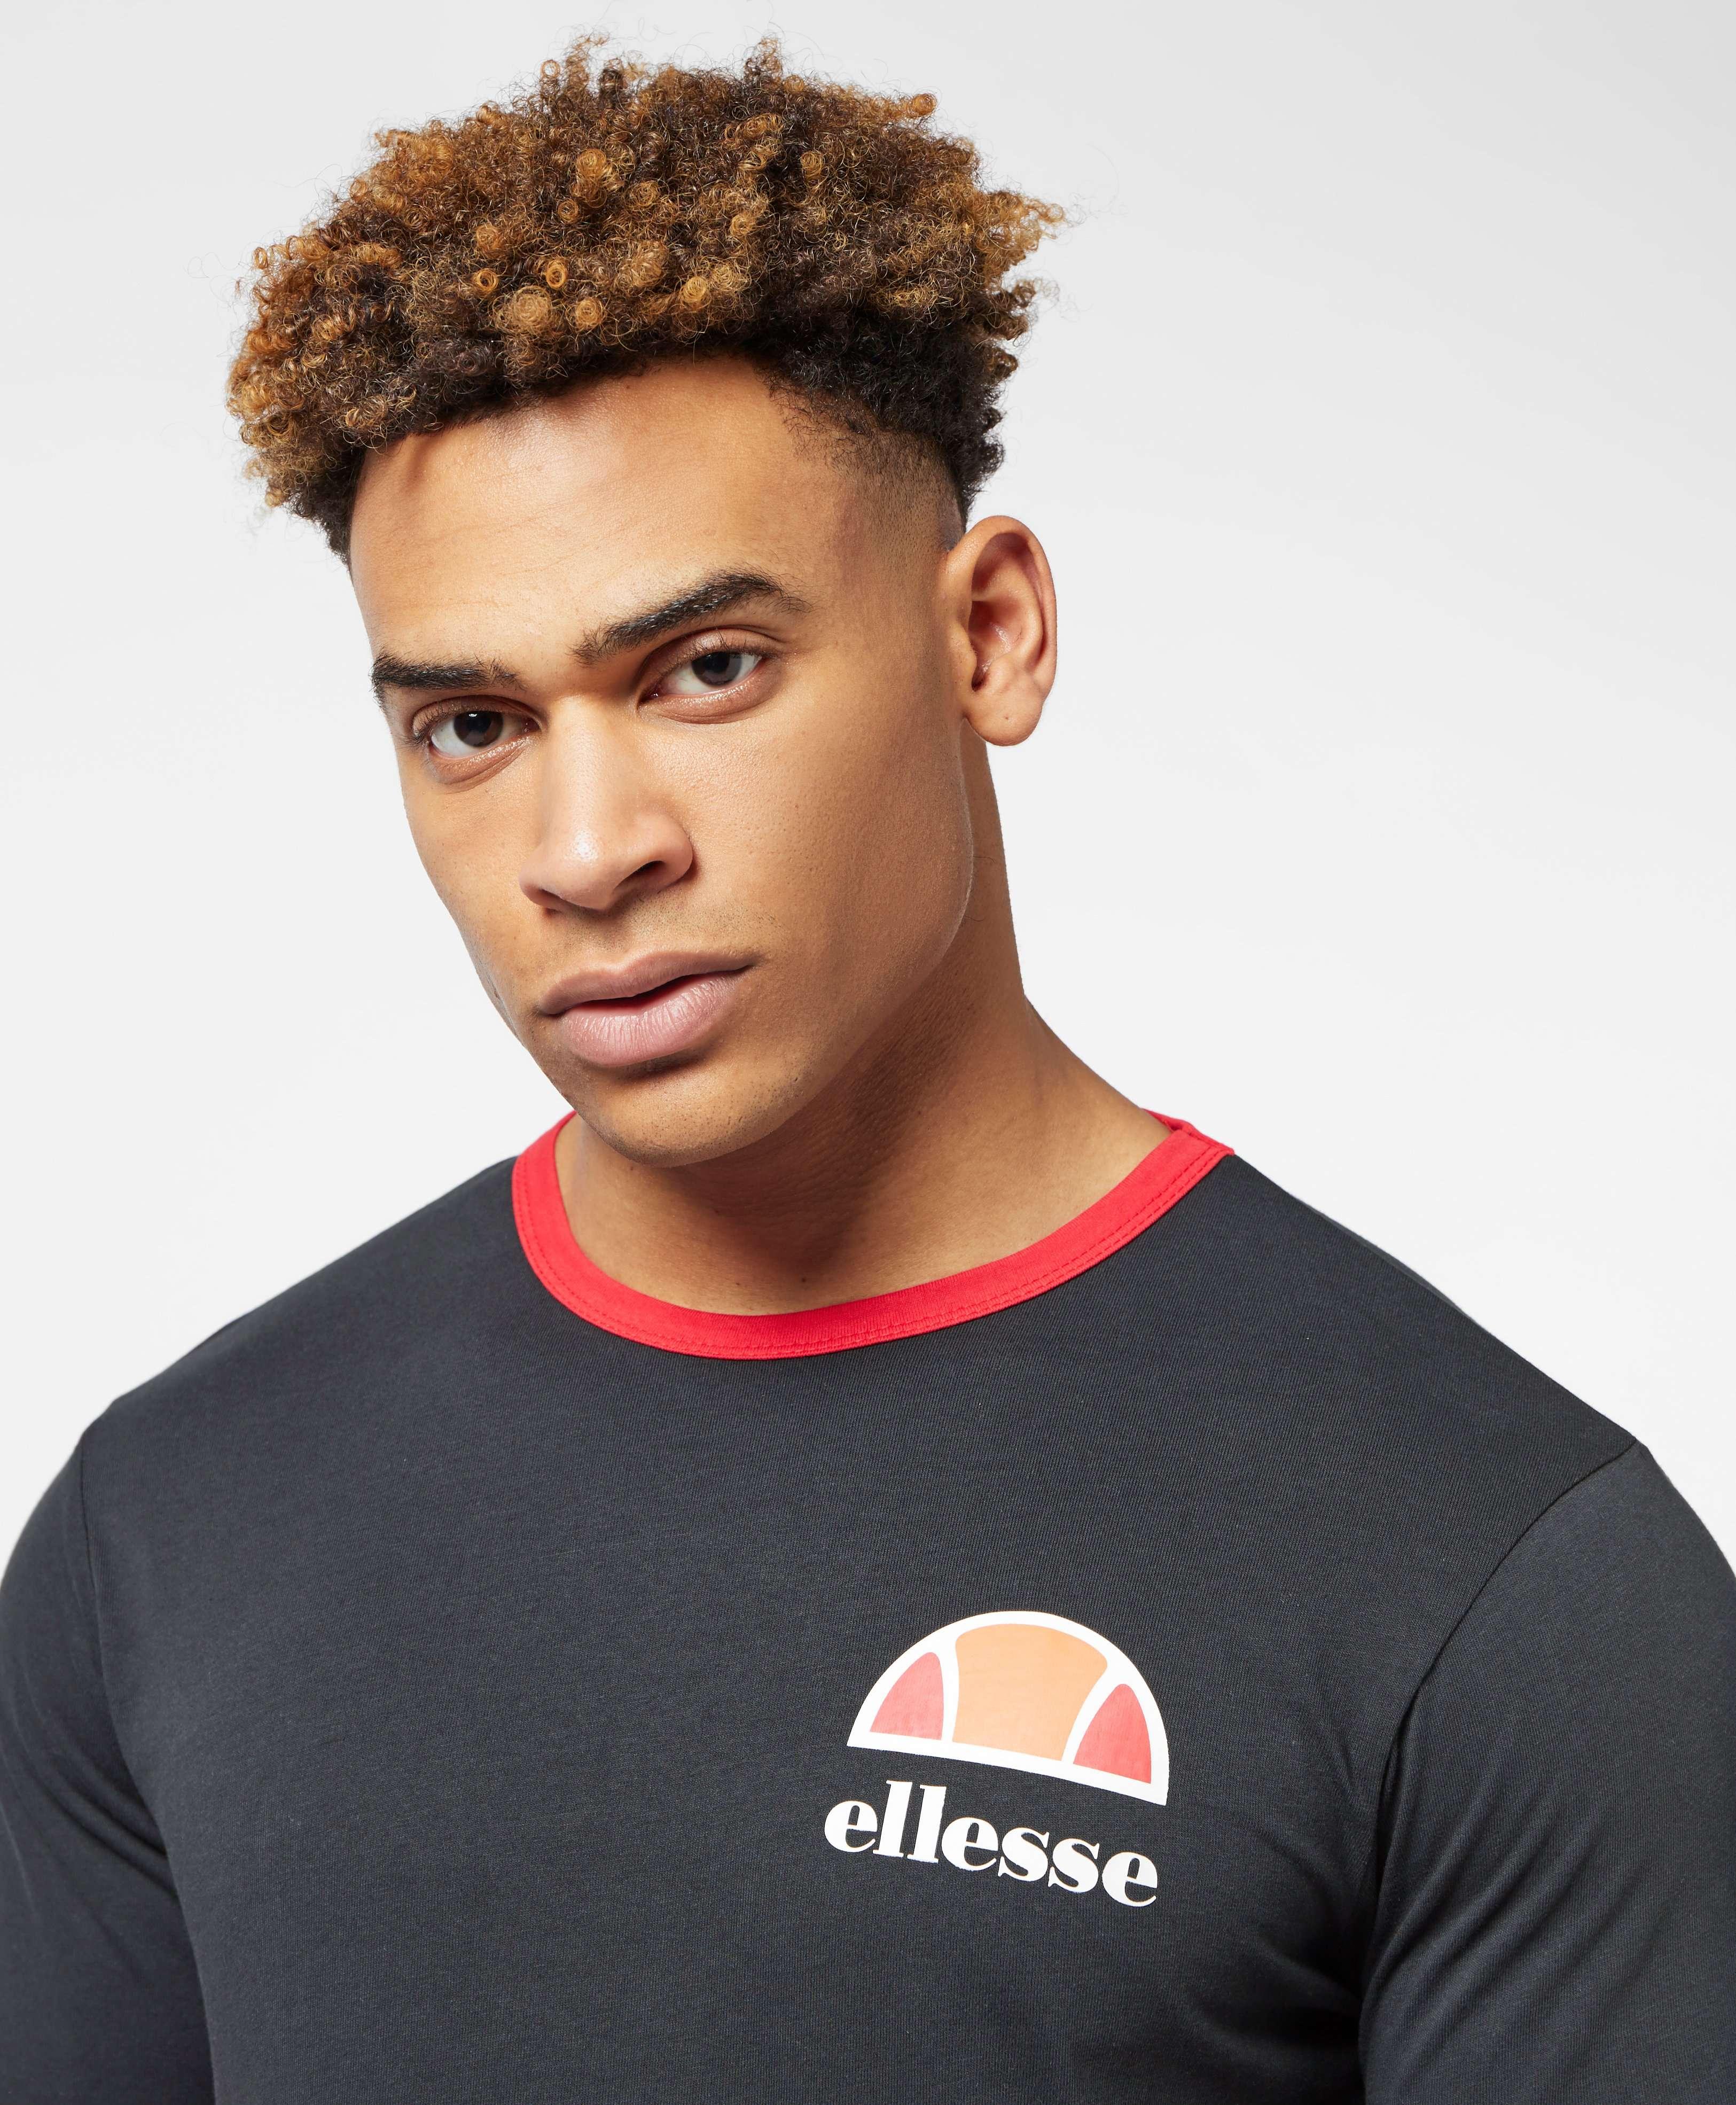 Ellesse Algila Short Sleeve T-Shirt - Online Exclusive